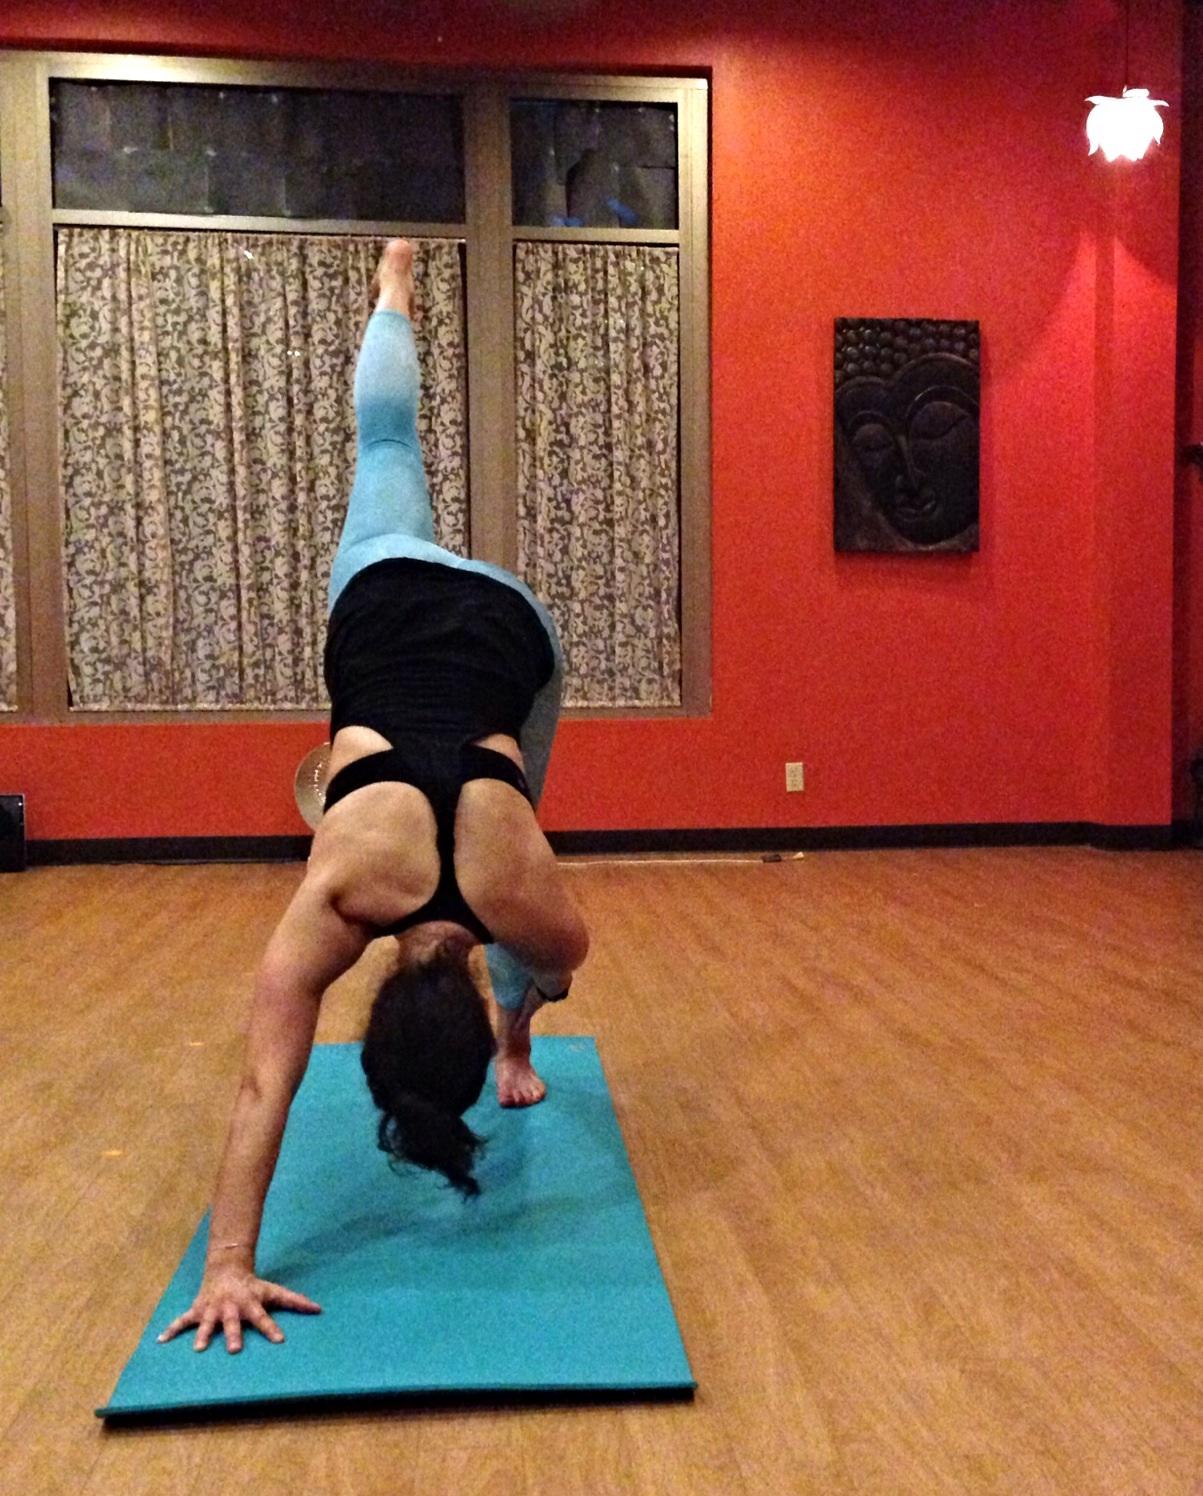 Balancing 3-legged Down Dog